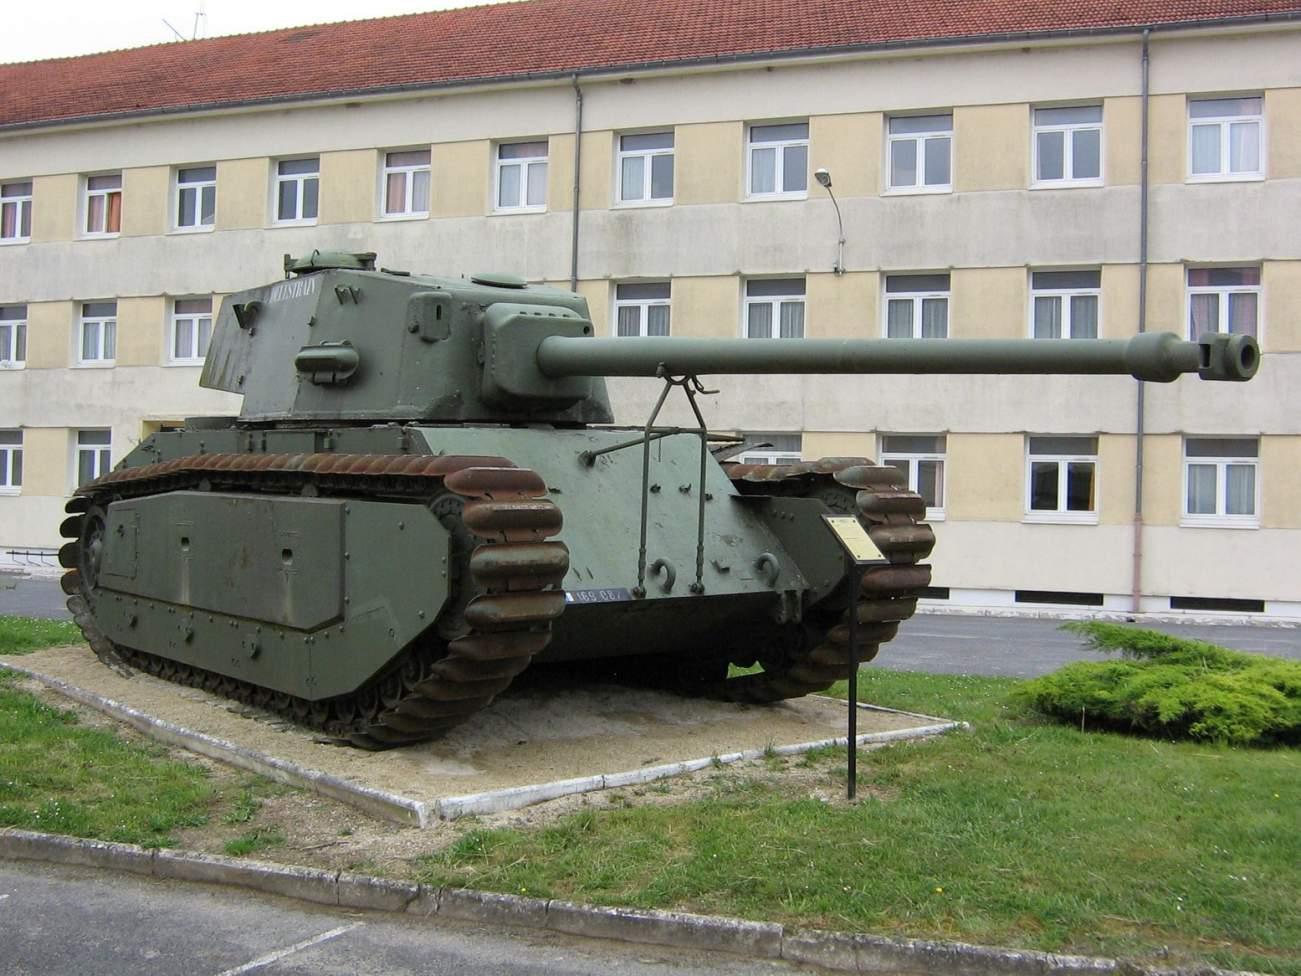 Meet the ARL-44: France's Anti-Nazi Tank (That Used German Parts)